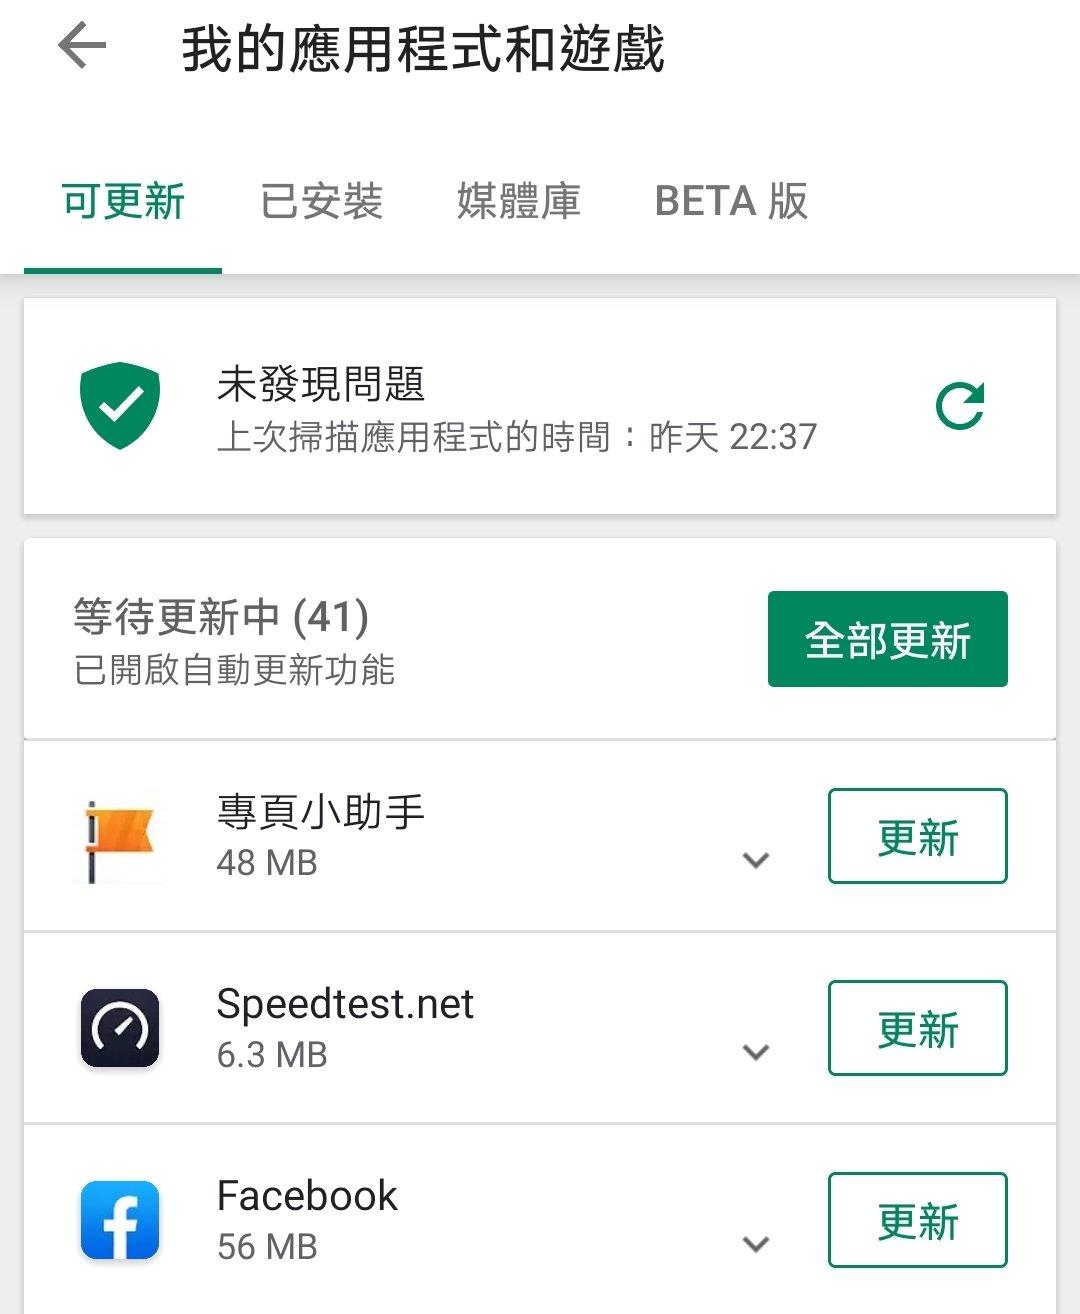 Google Play 商店無法自動更新與下載 APP 該怎麼辦? - 傳說中的挨踢部門